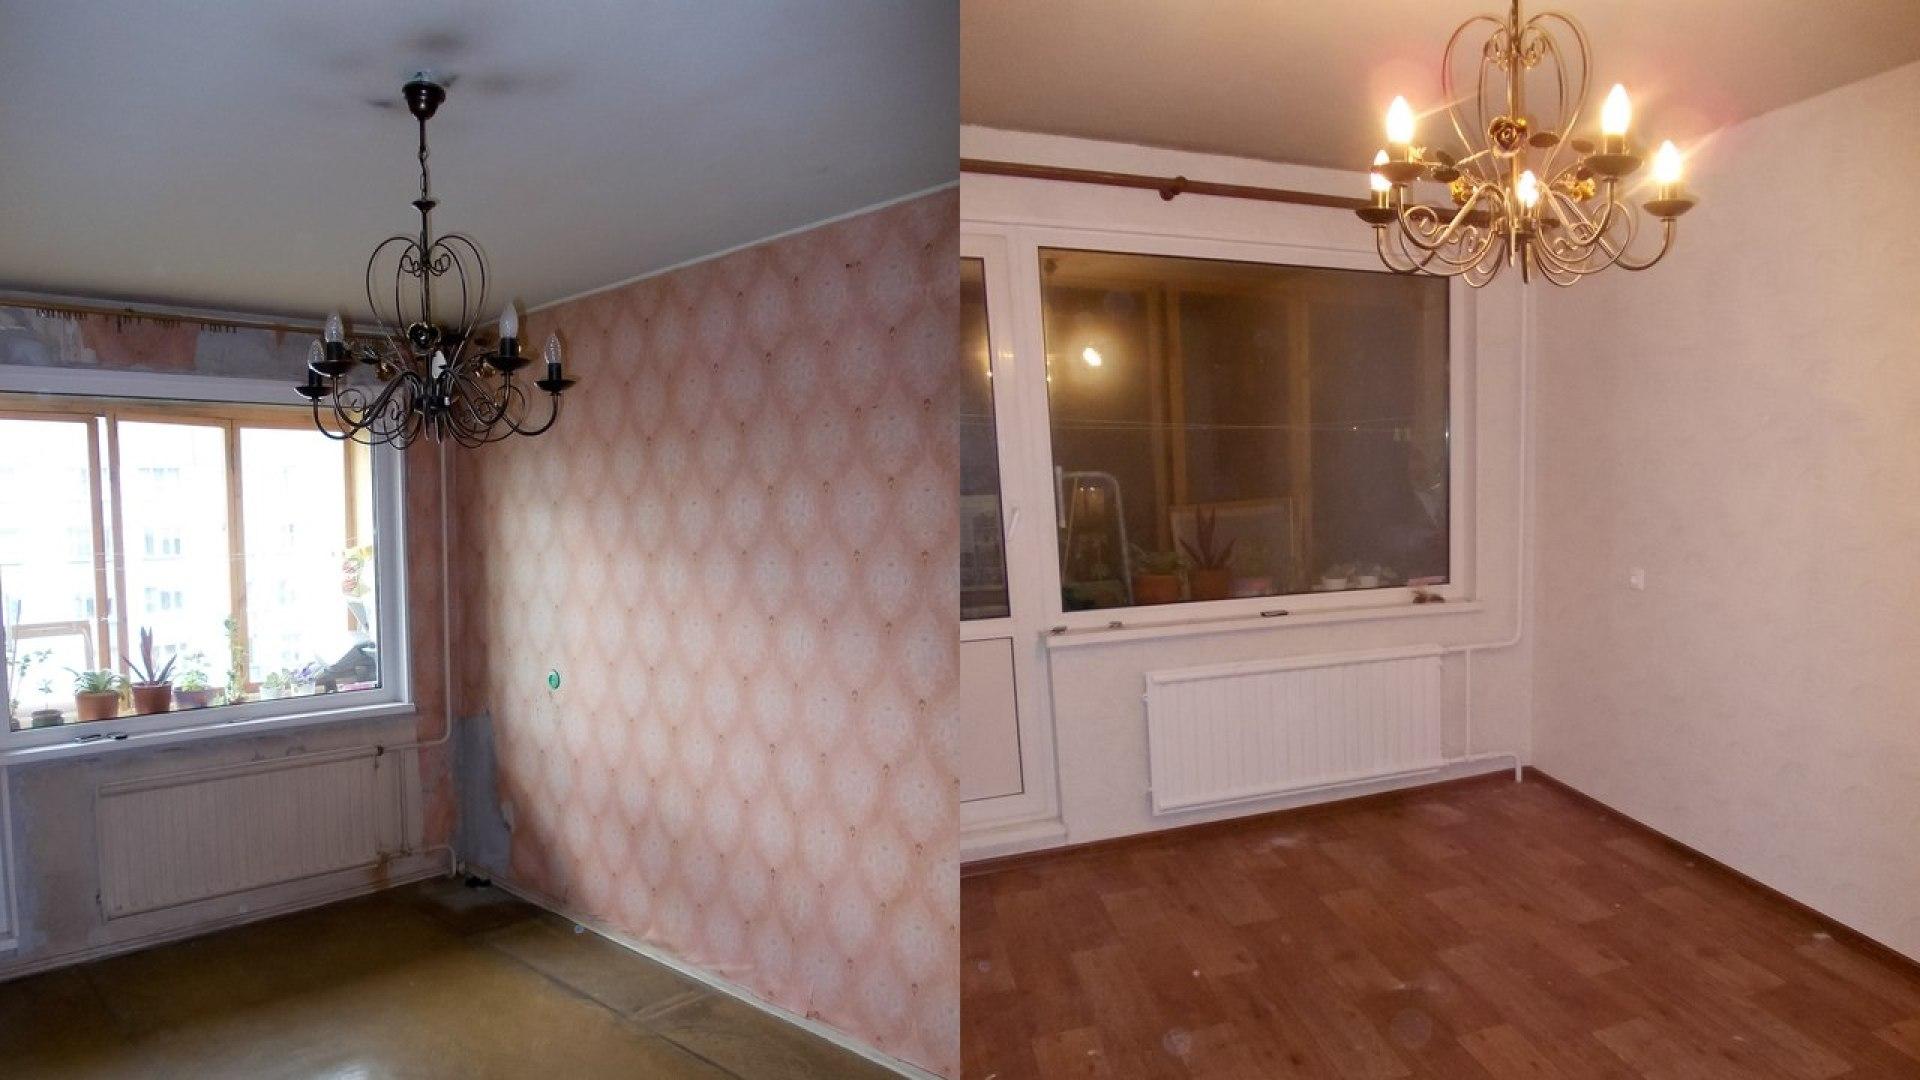 Ремонт квартиры и дома своими руками фото